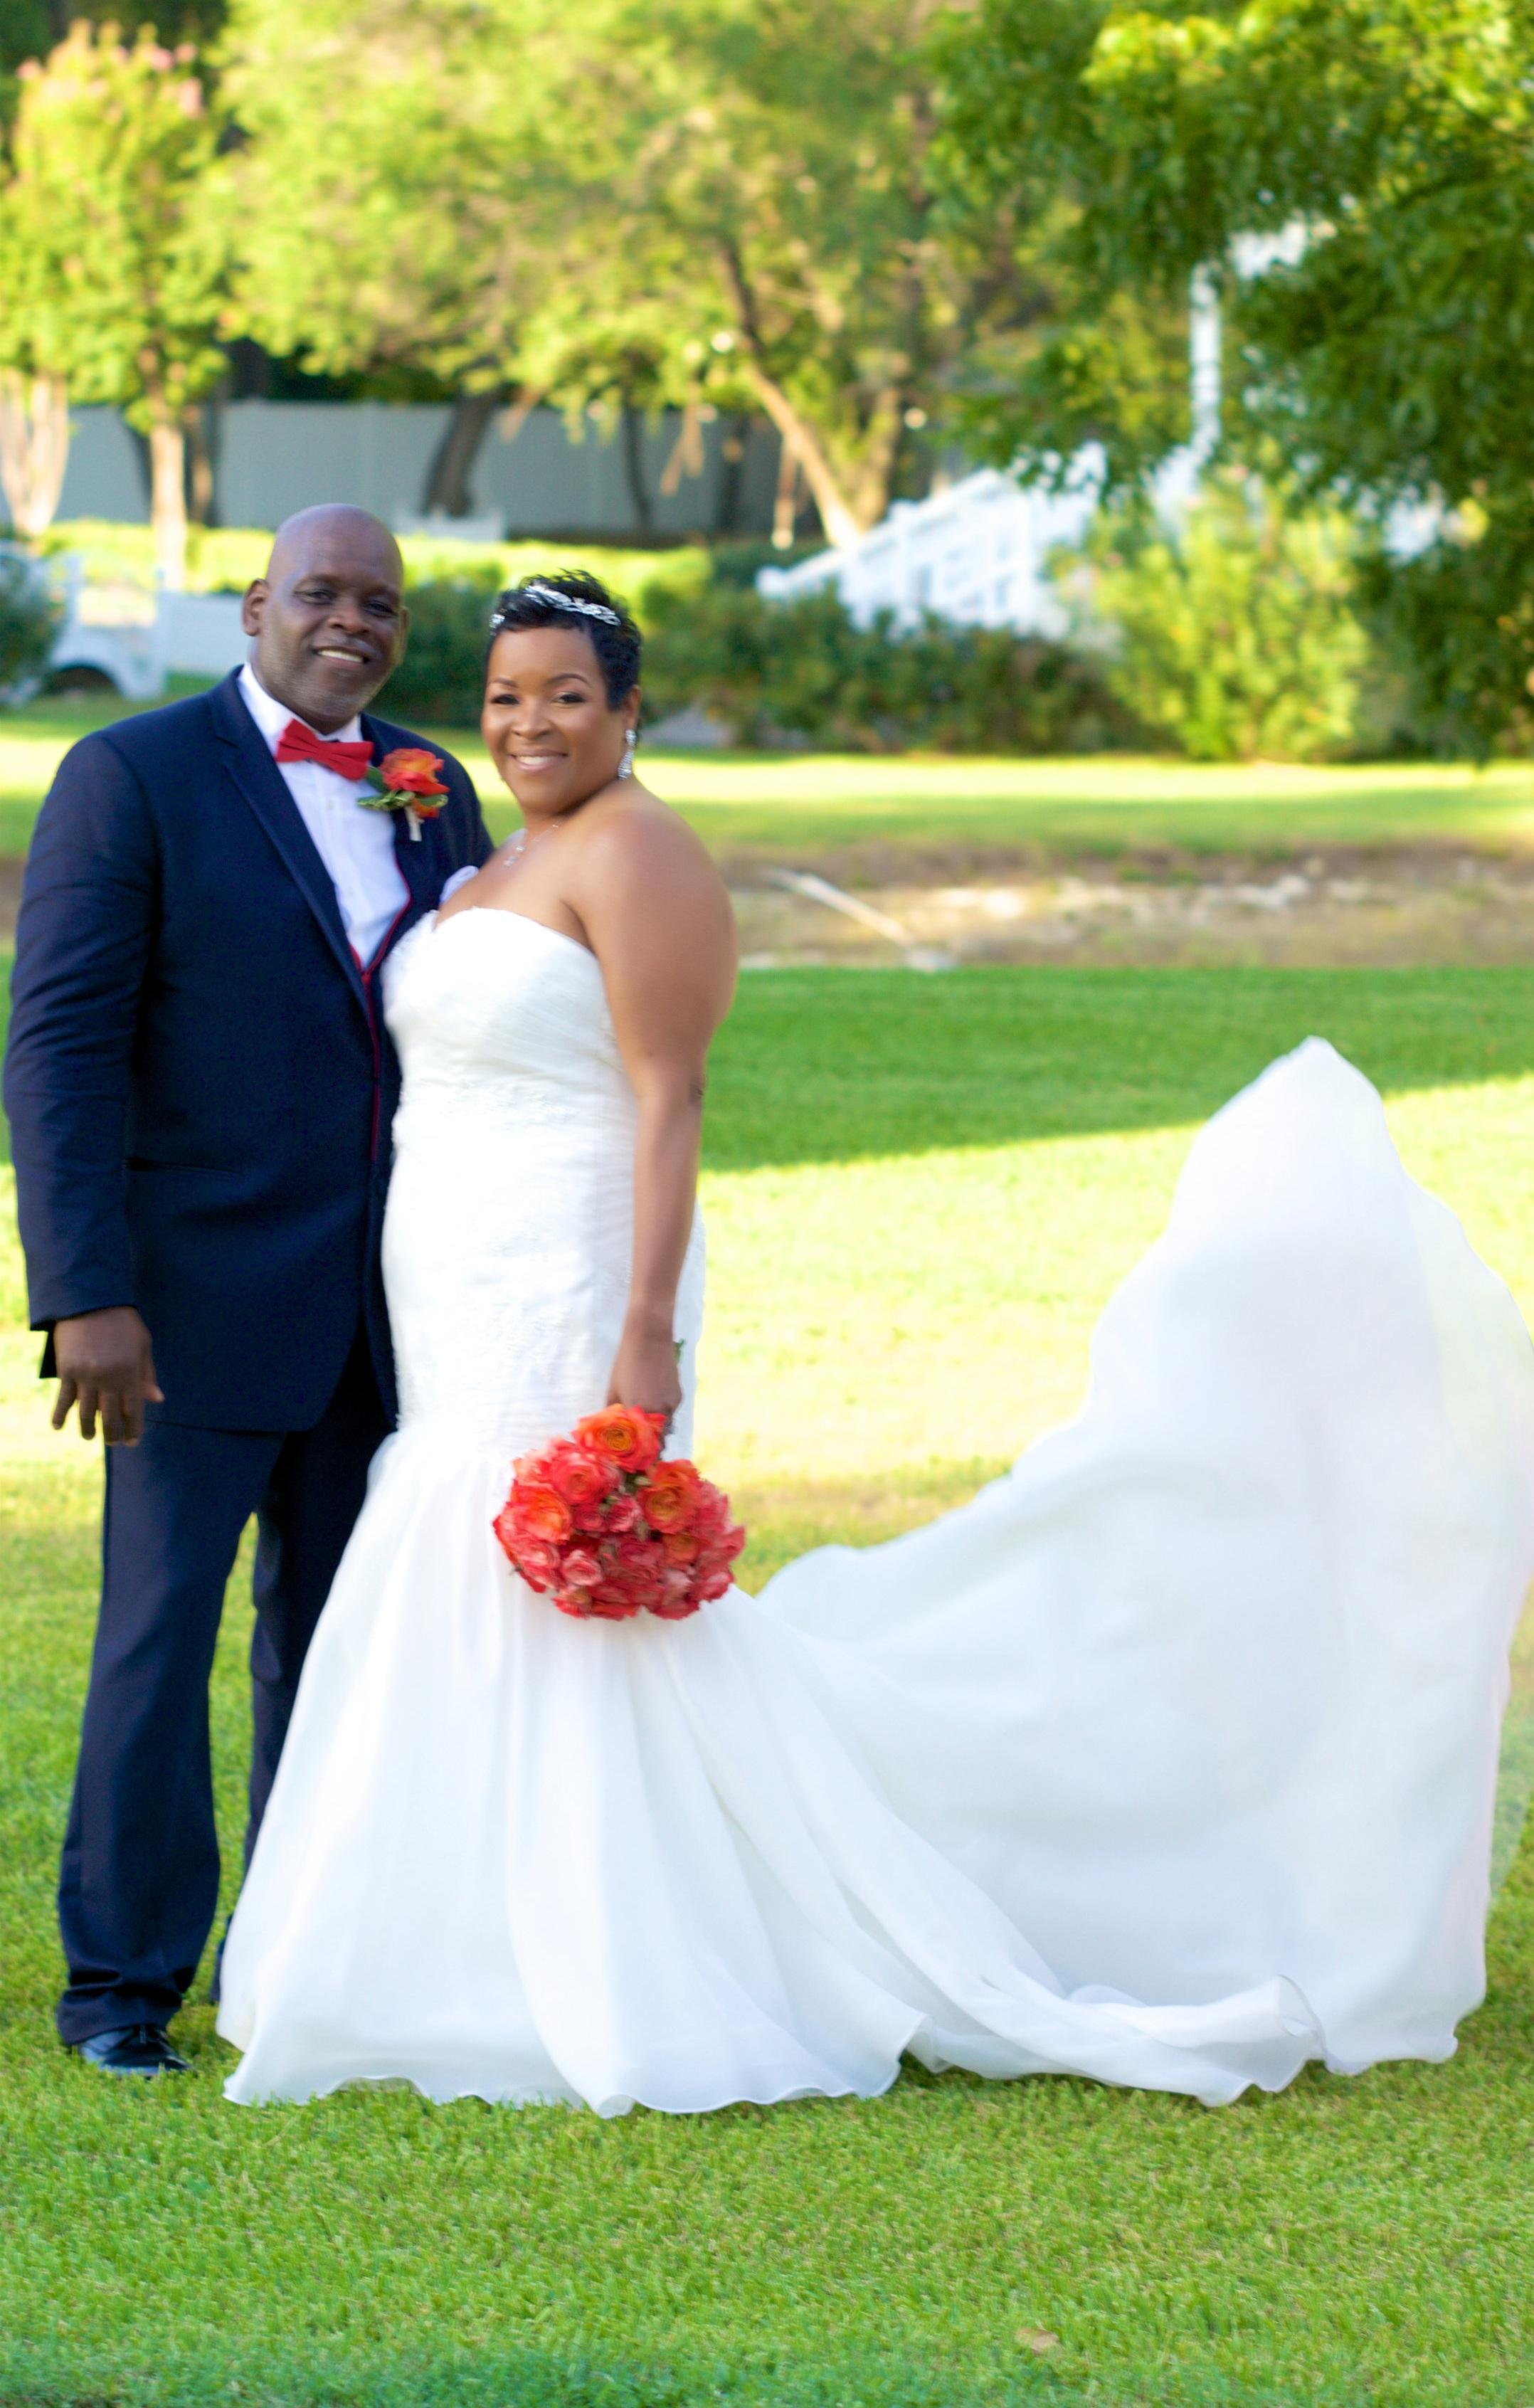 Phyllis & Dessee's Wedding - CEDAR HILL TEXAS